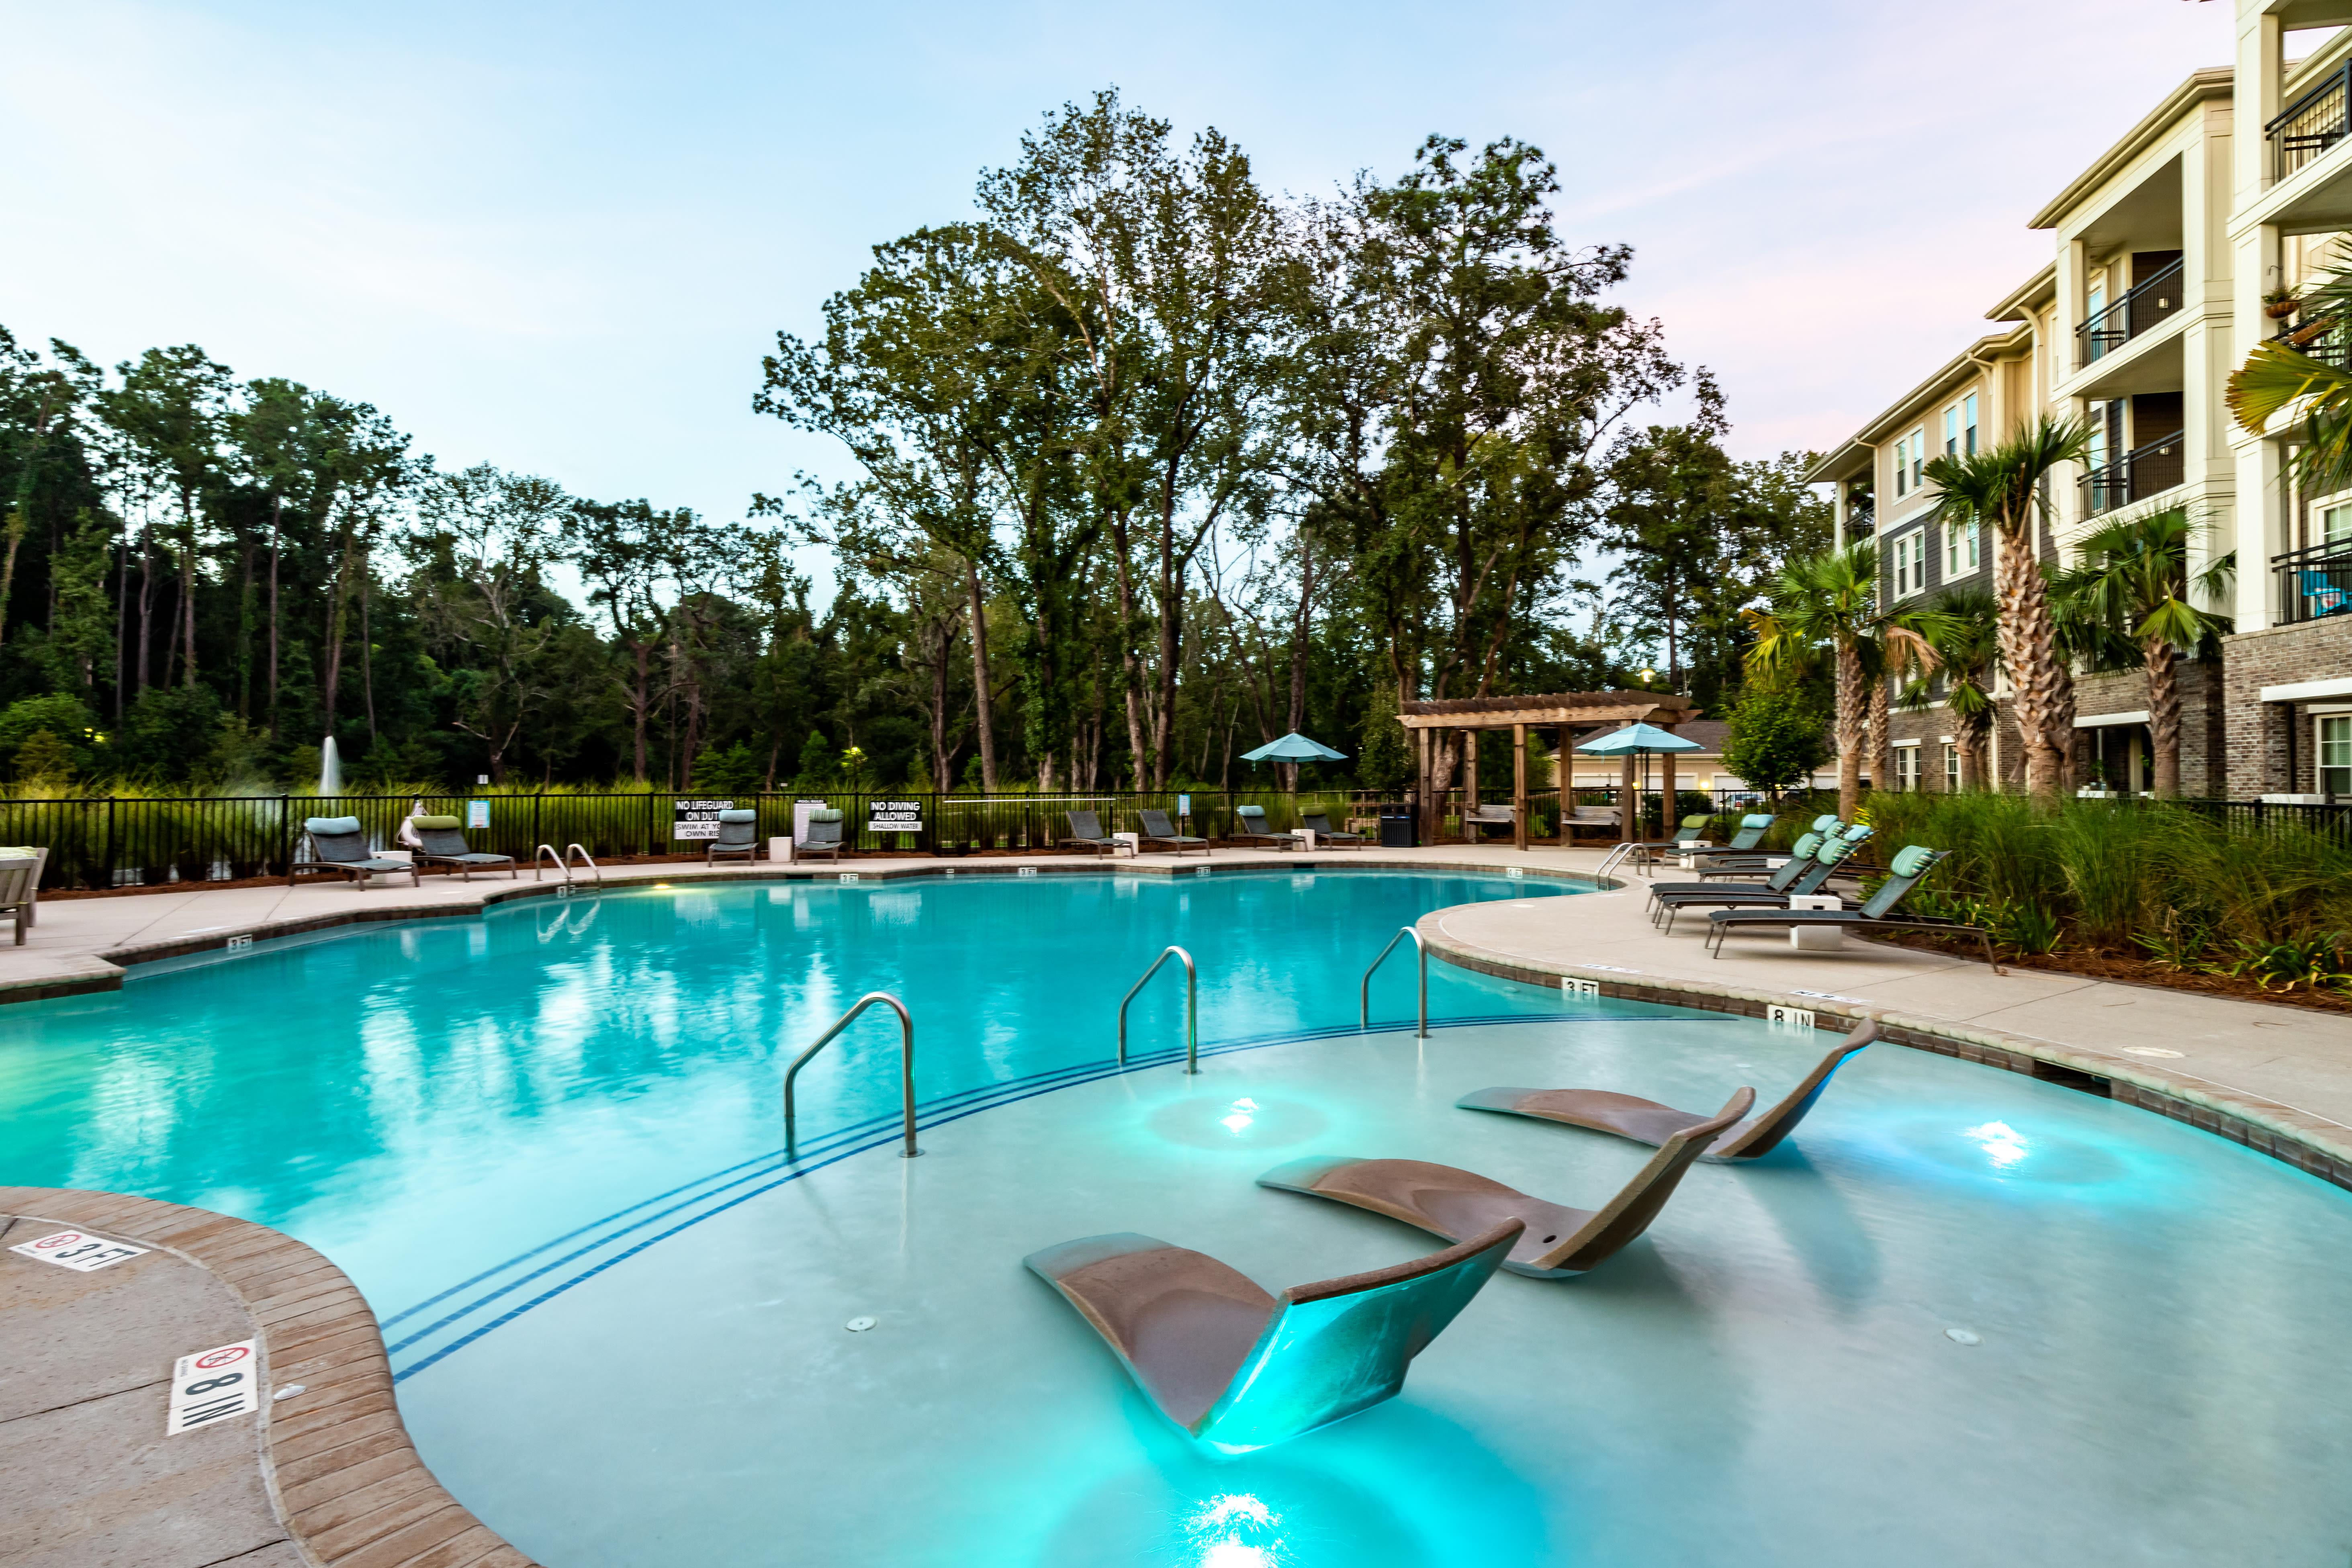 Pool with chairs at The Heyward in Charleston, South Carolina